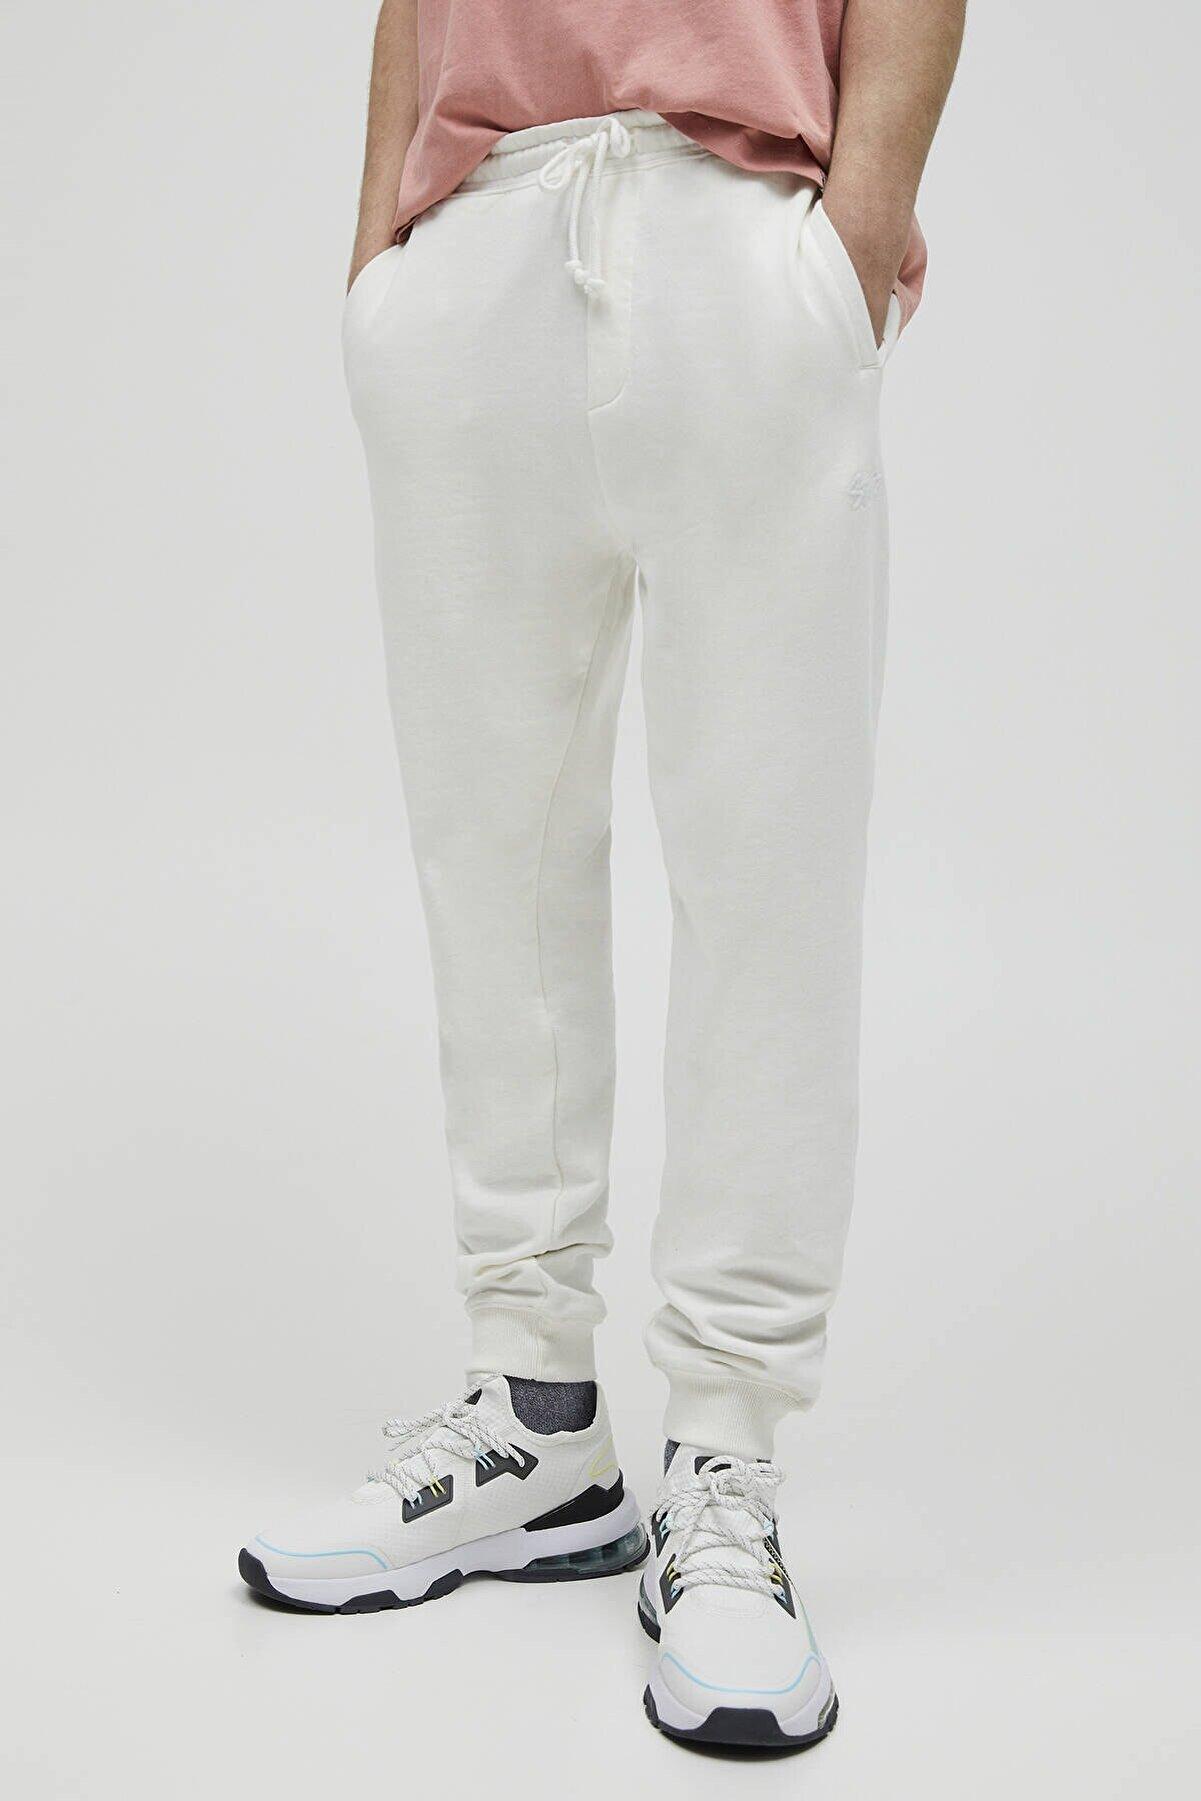 Pull & Bear Erkek Kırık Beyaz Renkli Jogging Fit Pantolon